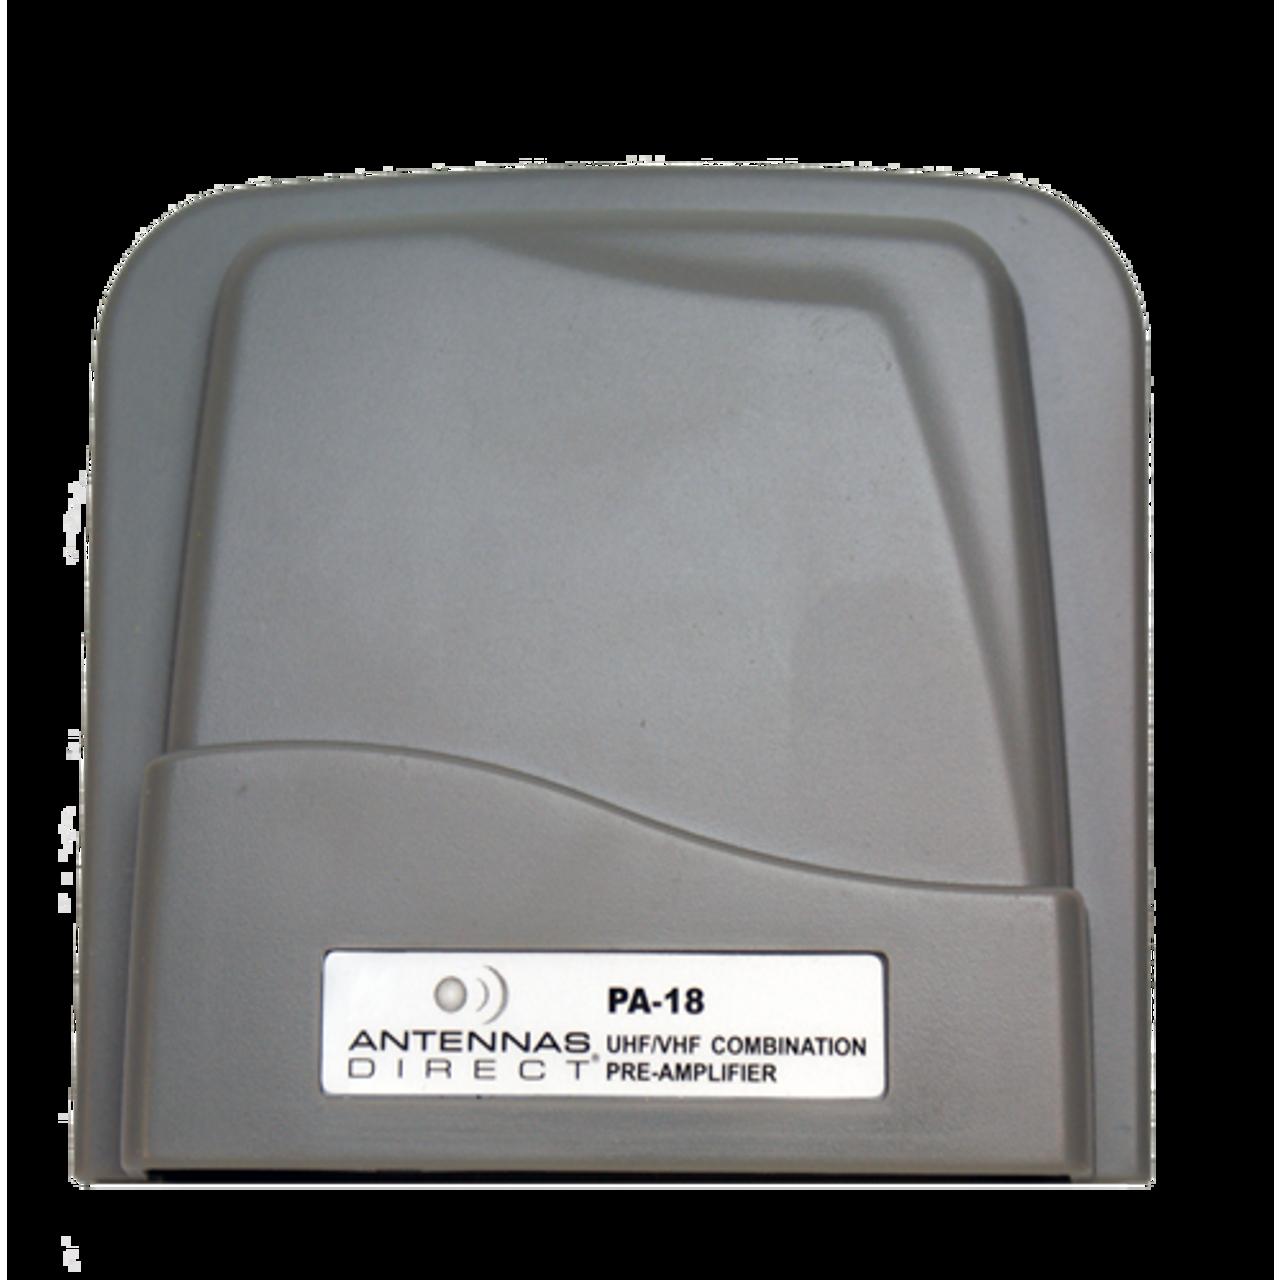 PA18 UHF/VHF Antenna Pre-Amplifier Kit